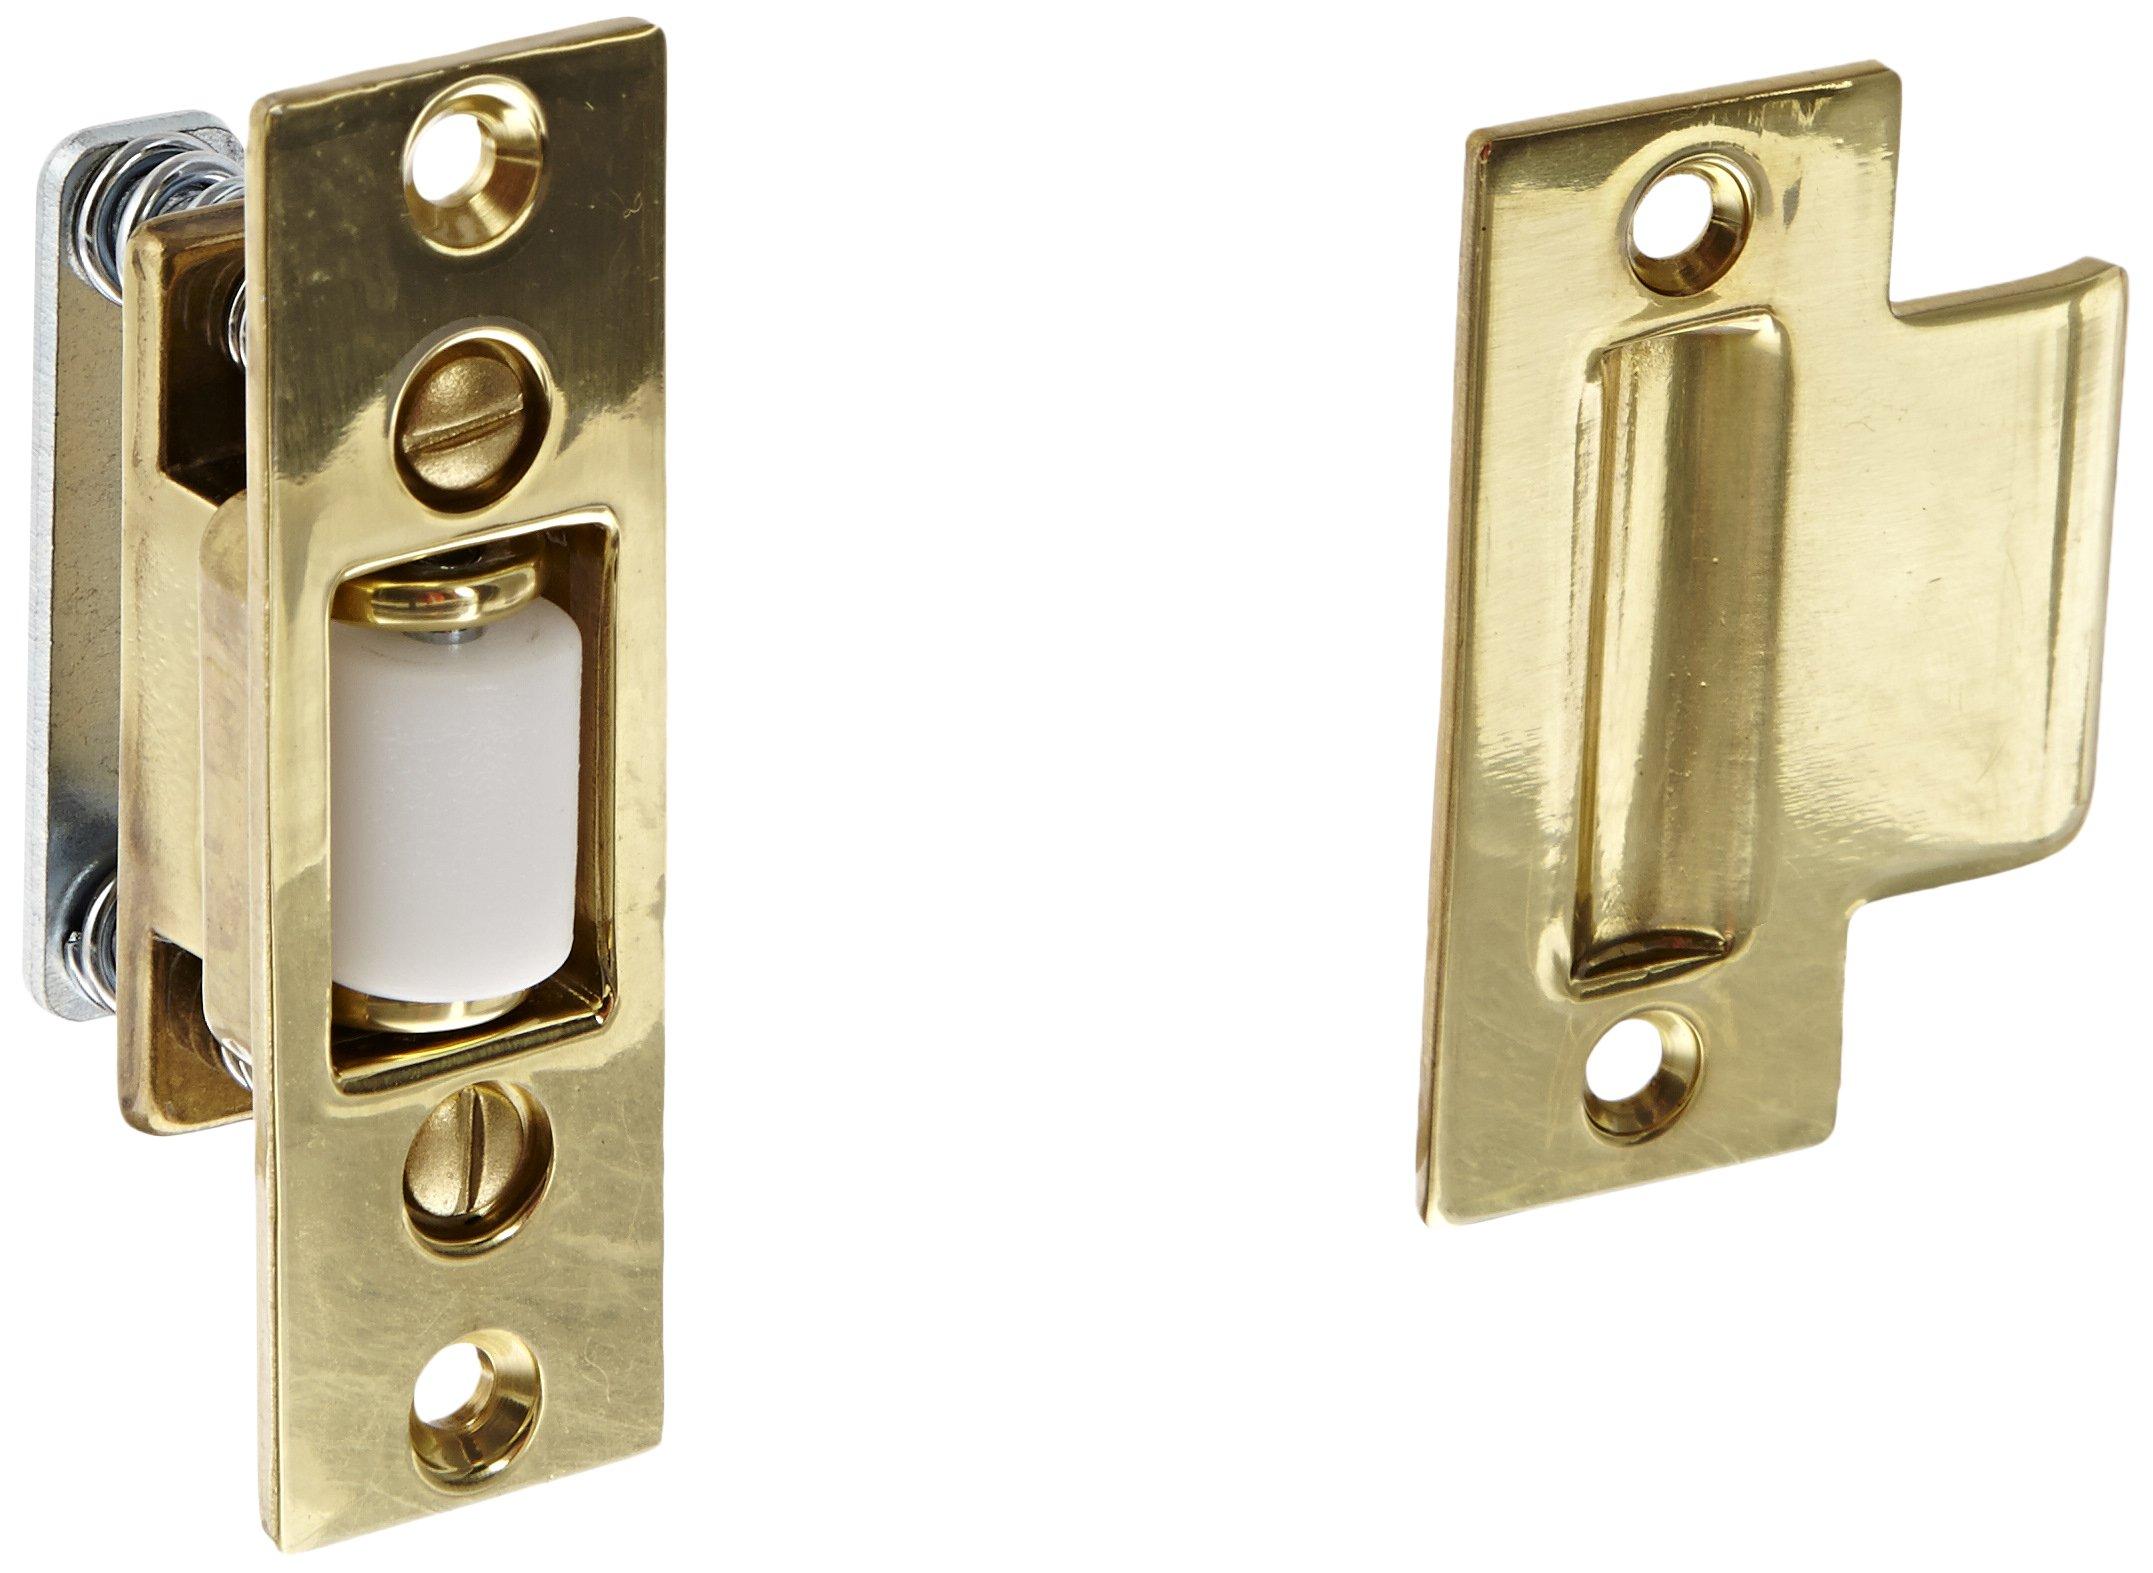 Rockwood 592.3 Brass Roller Latch with #161 Strike, 1'' Width x 3-3/8'' Length, 1-1/8'' Strike Width x 2-3/4'' Strike Length, Polished Clear Coated Finish